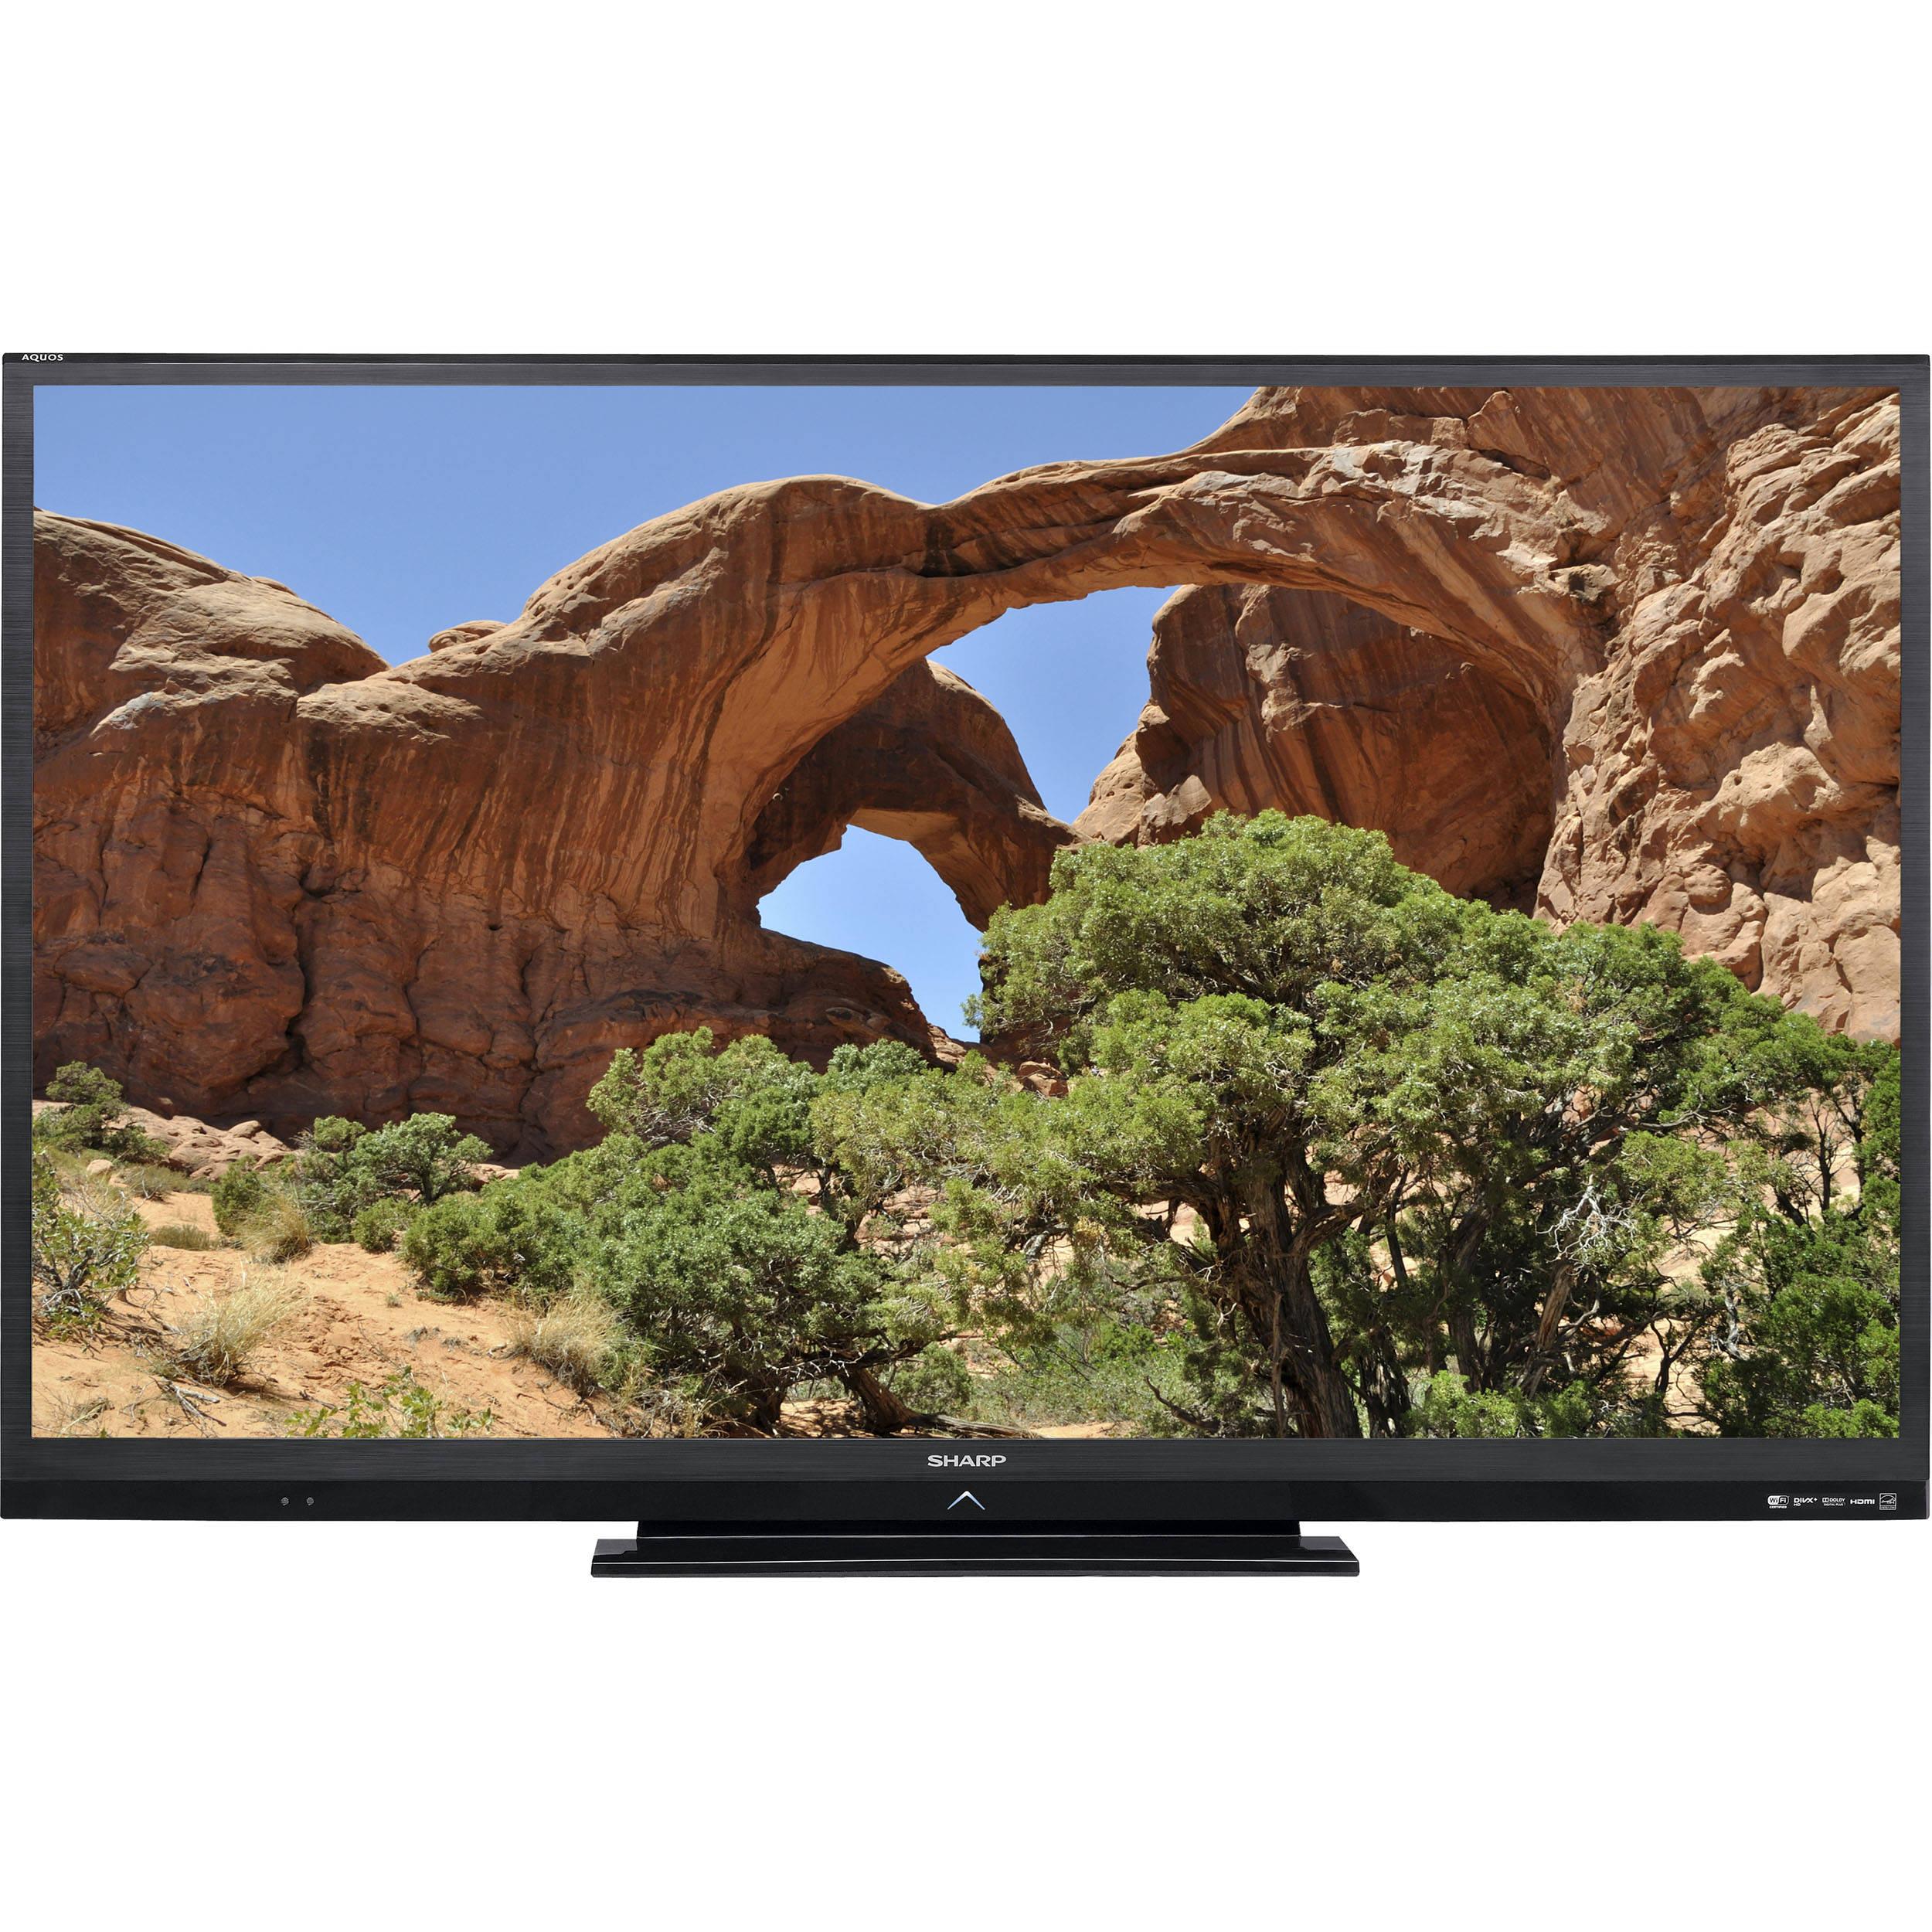 SHARP LC-52LE640U Smart TV Drivers for Windows Download